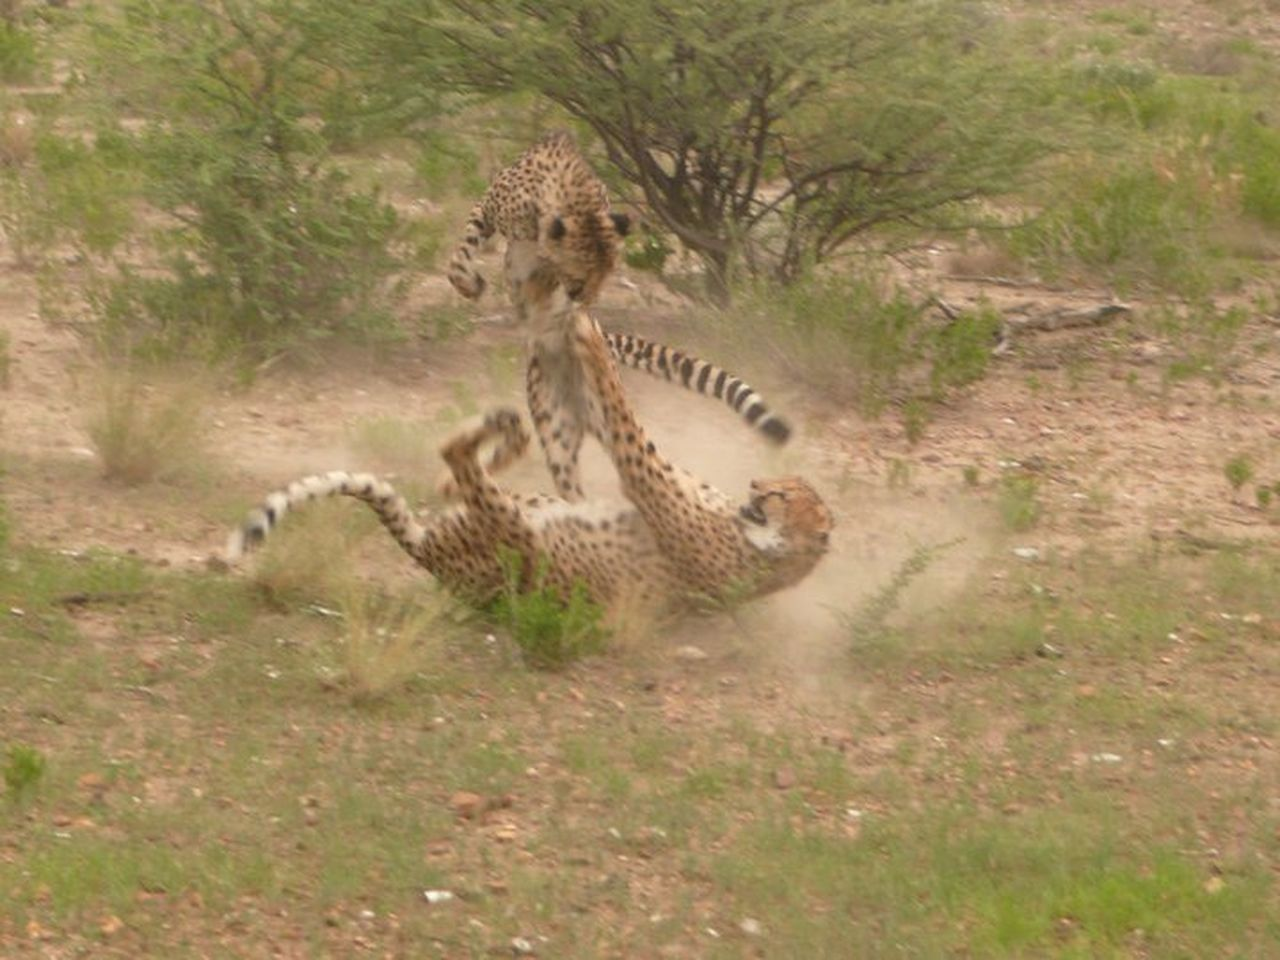 animals in the wild, animal themes, one animal, grass, mammal, field, wildlife, animal wildlife, day, nature, outdoors, no people, animal markings, full length, safari animals, cheetah